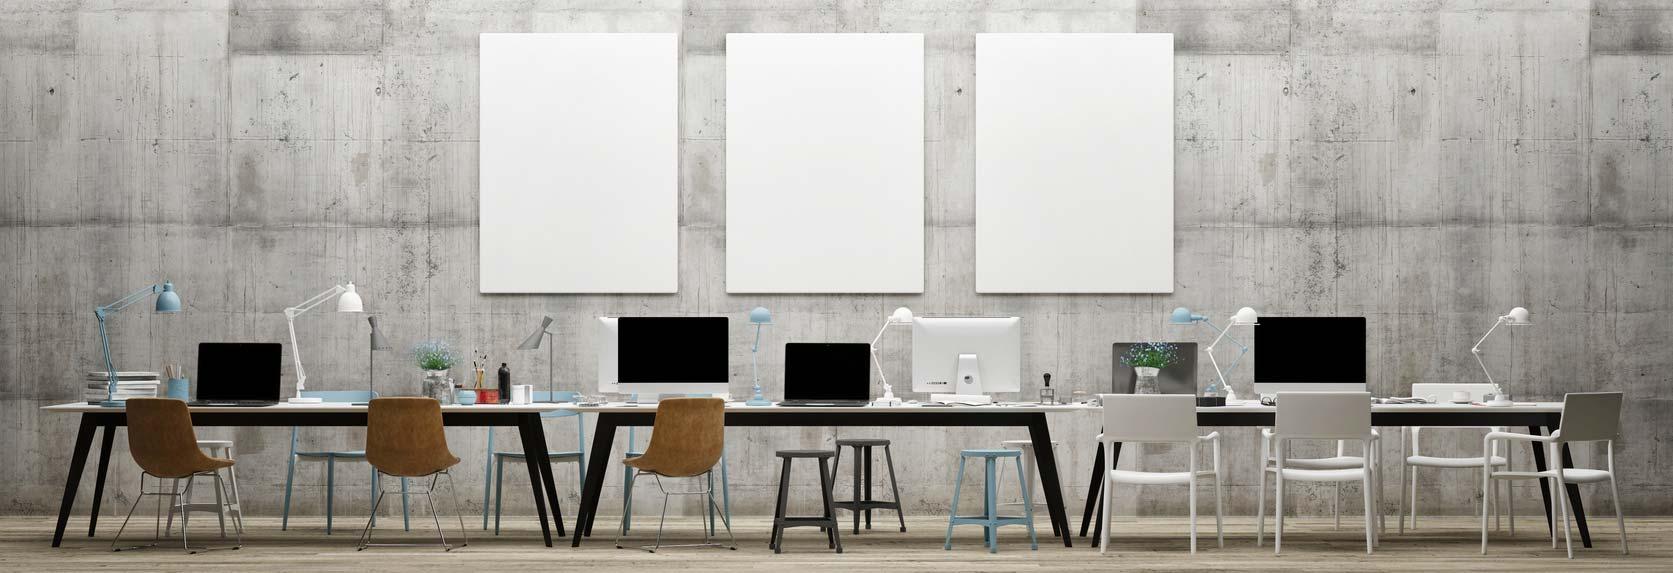 dream office environment